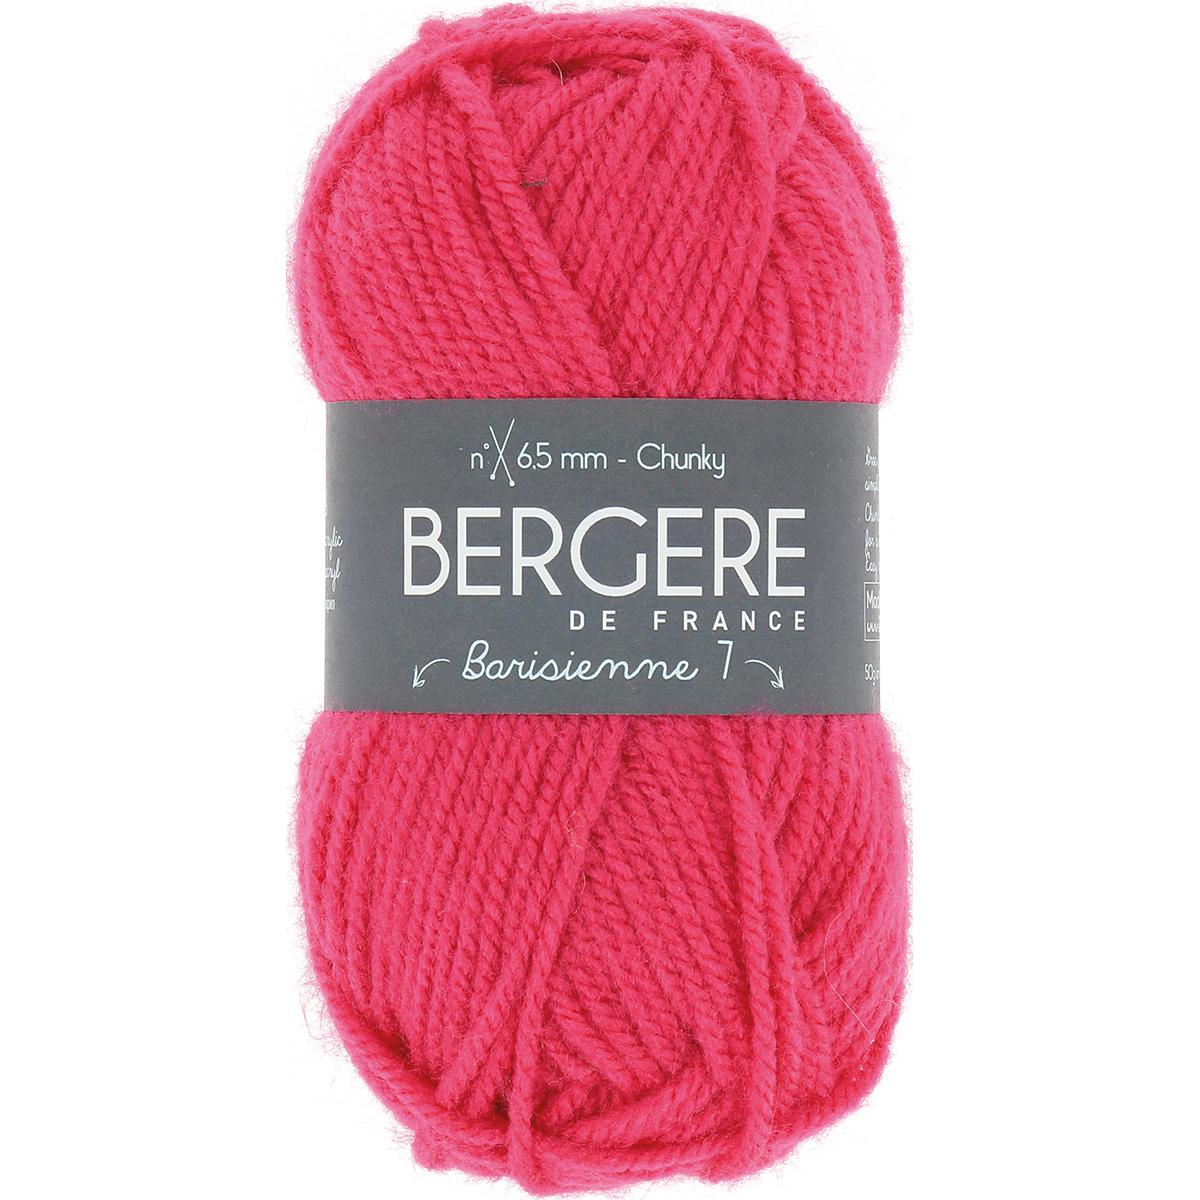 Bergere De France BARISIE7-10219 Flamant - Barisienne 7 Yarn